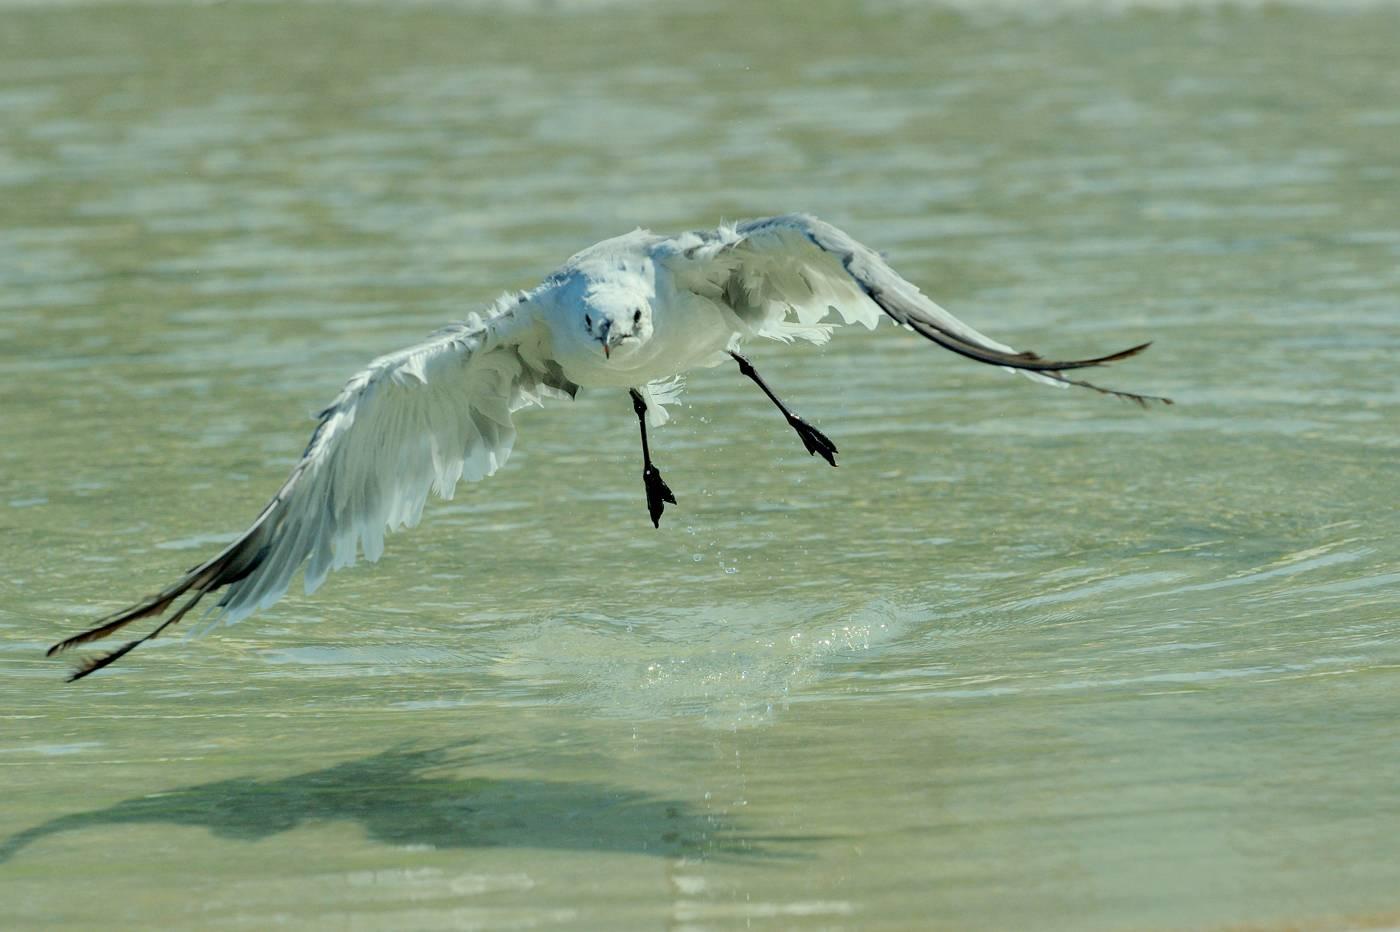 Séquence de bain - Gulls taking a bath